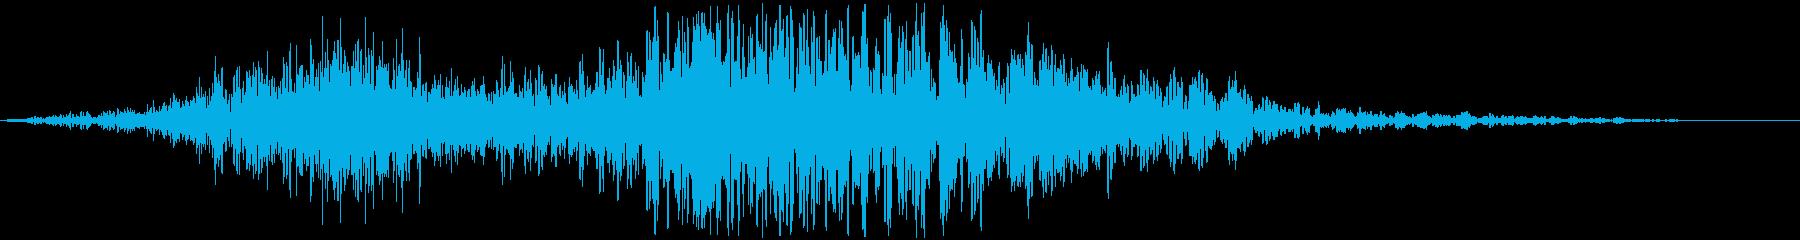 WHOOSH_06 ヒューッドンッ・・の再生済みの波形